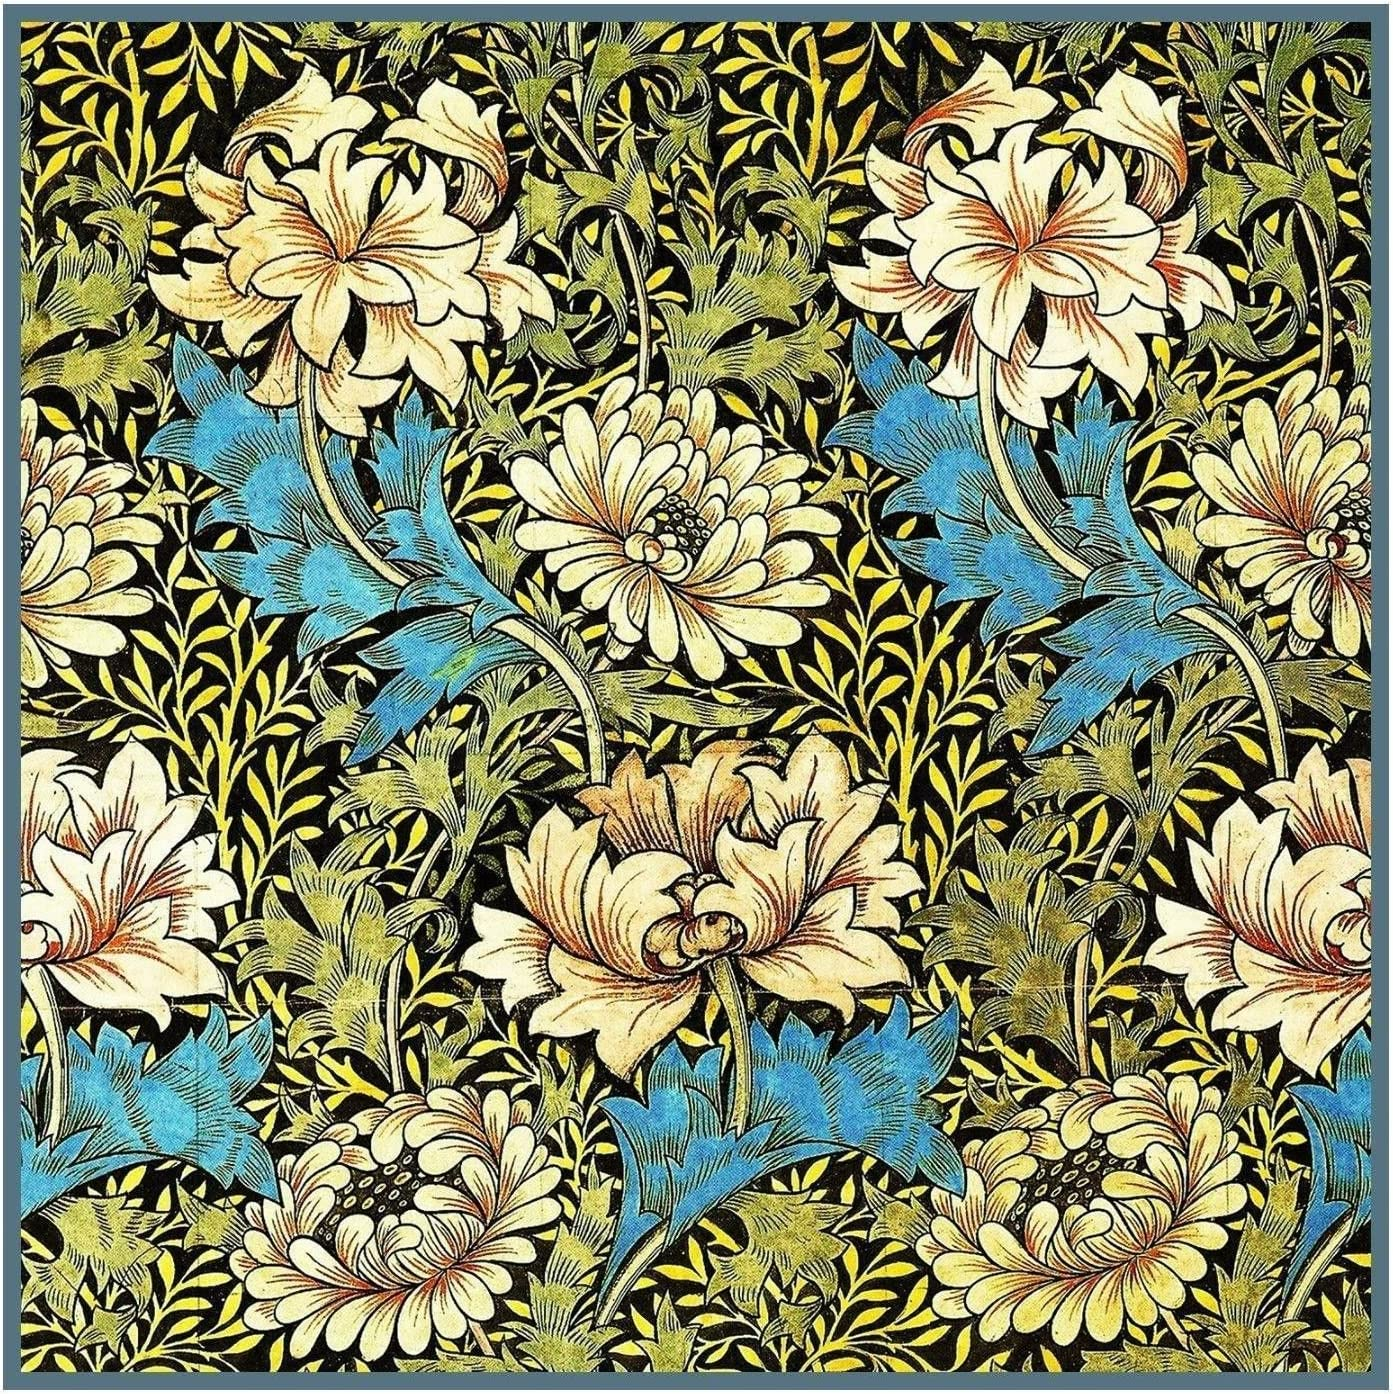 Orenco Originals Chrysanthemum Detail Blue Pink William Morris Design Counted Cross Stitch Pattern